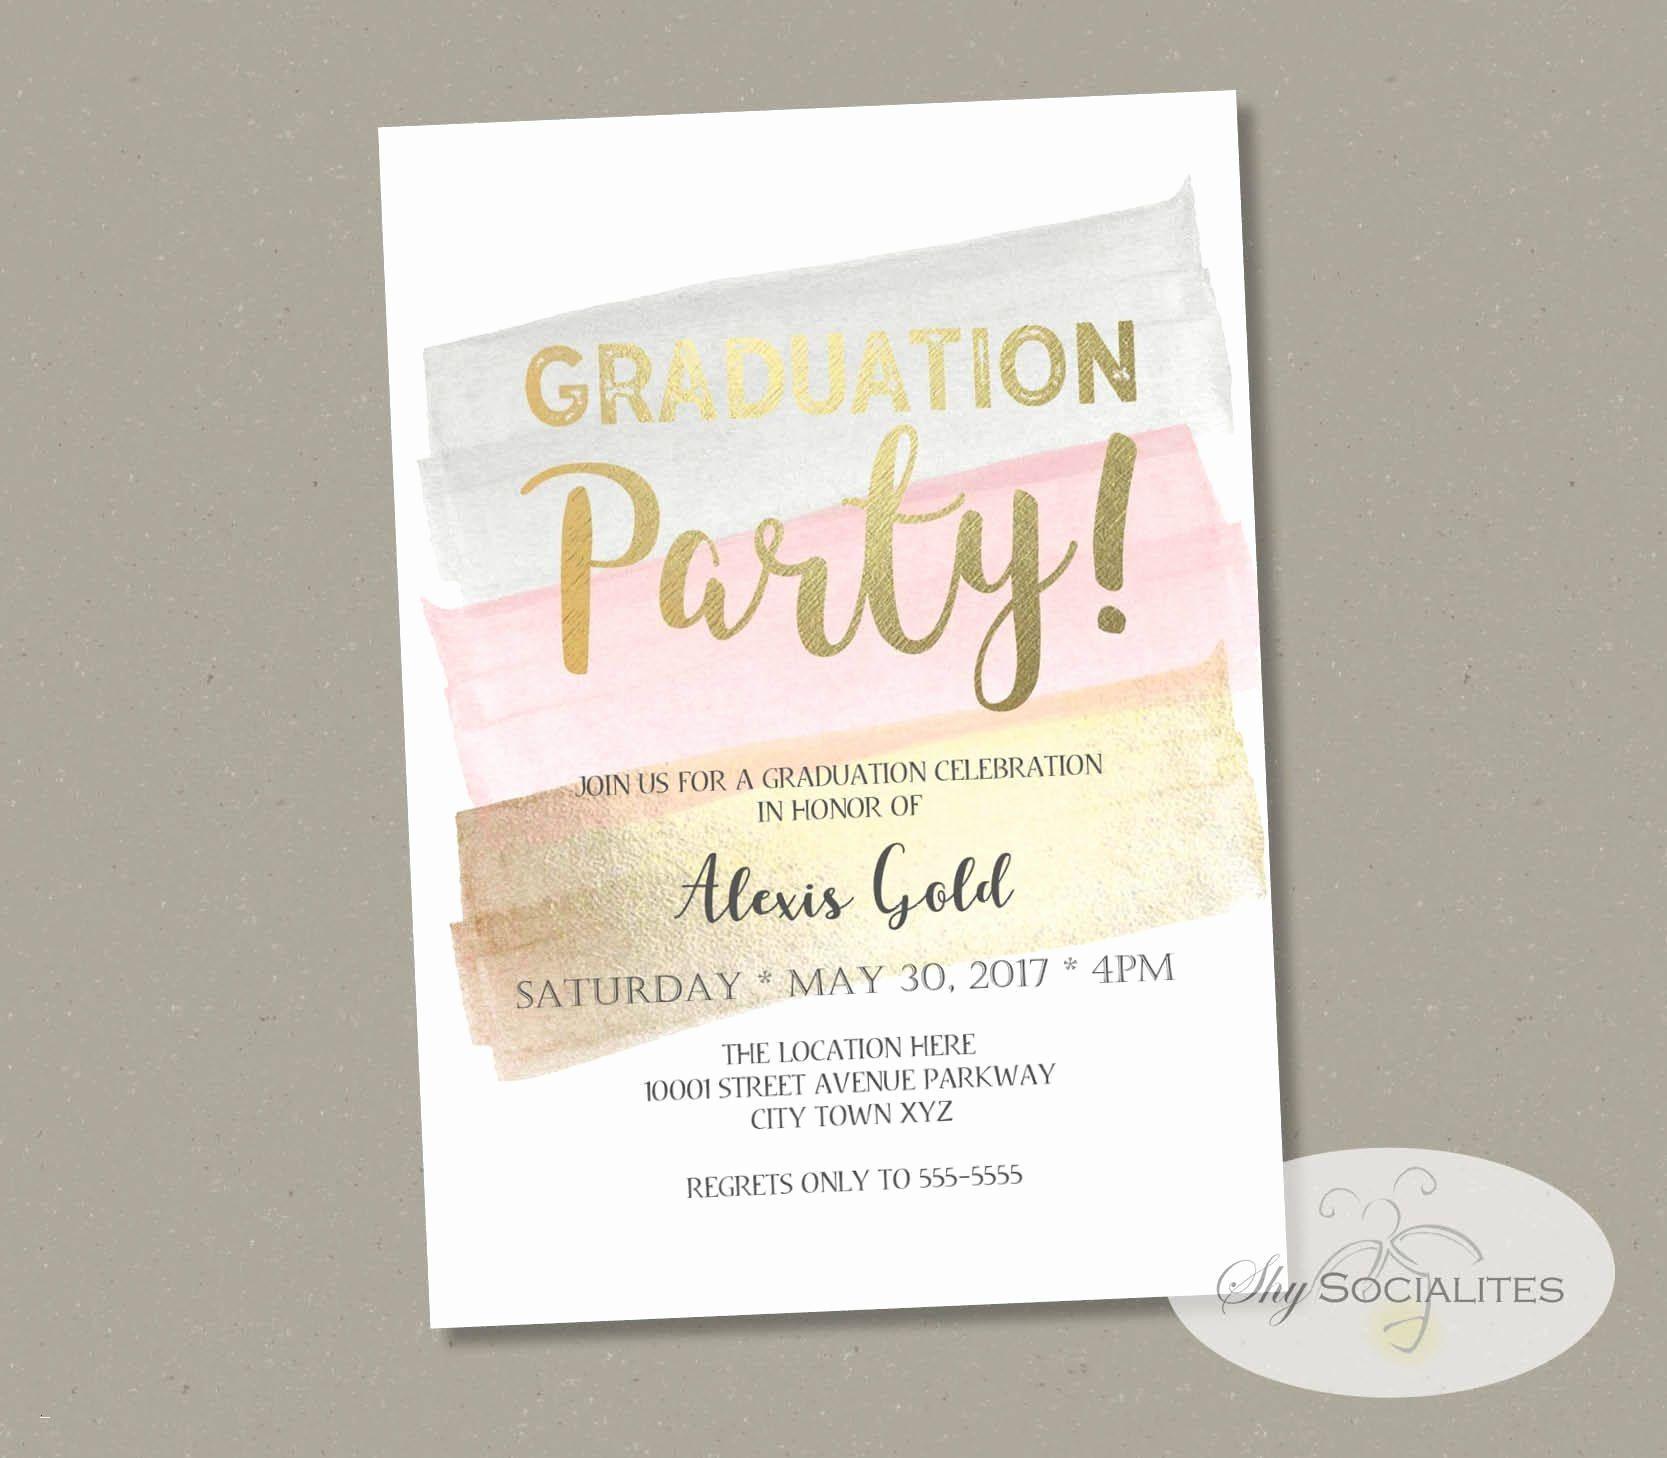 Graduation Open House Invitations Templates